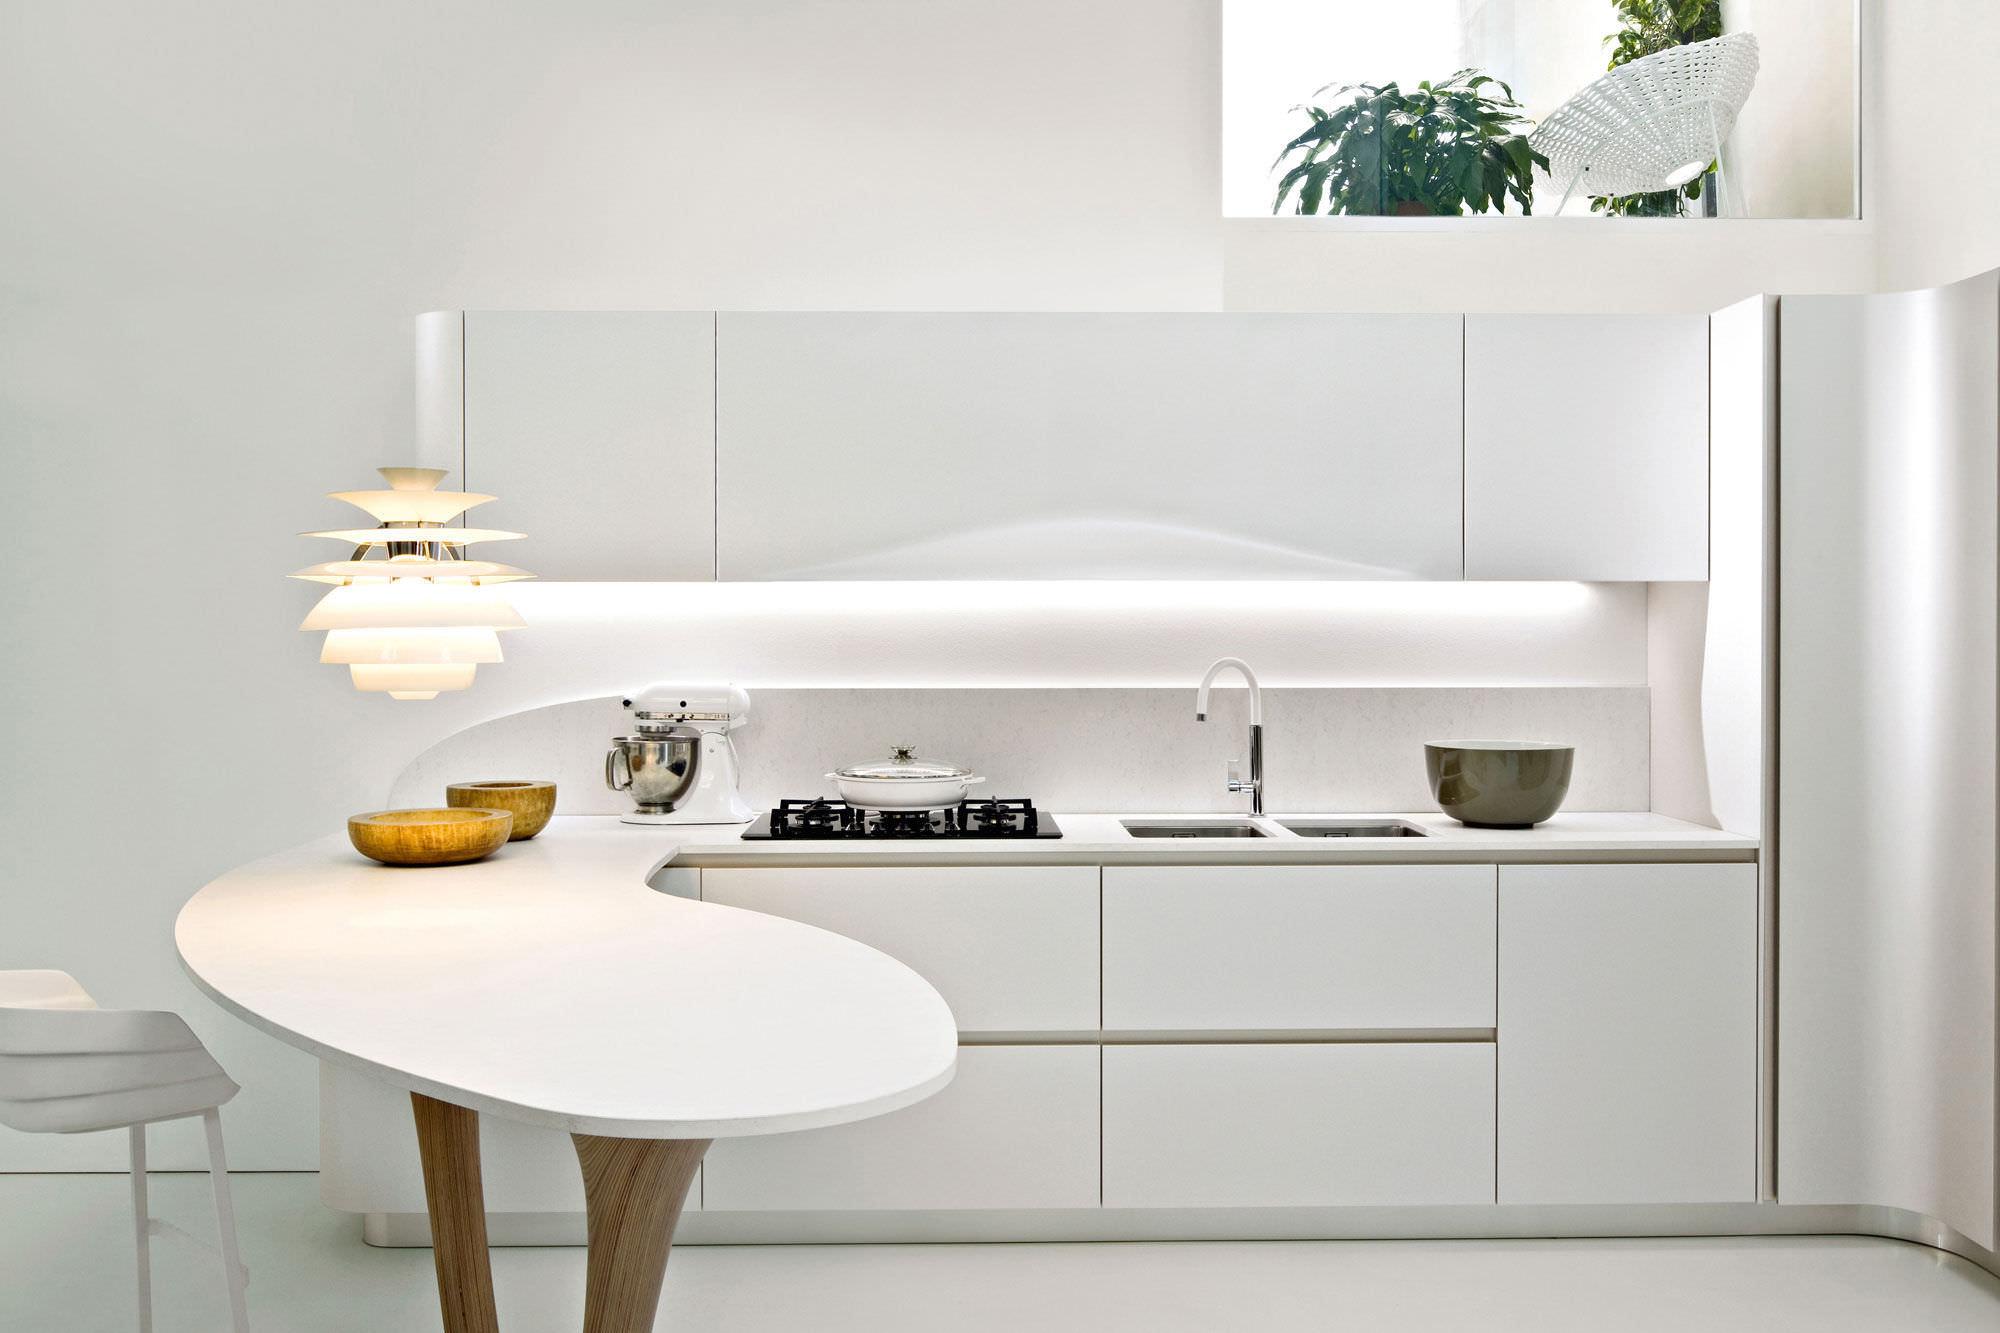 Moderne Küche / Holz / Kochinsel / lackiert - OLA 20 by ...